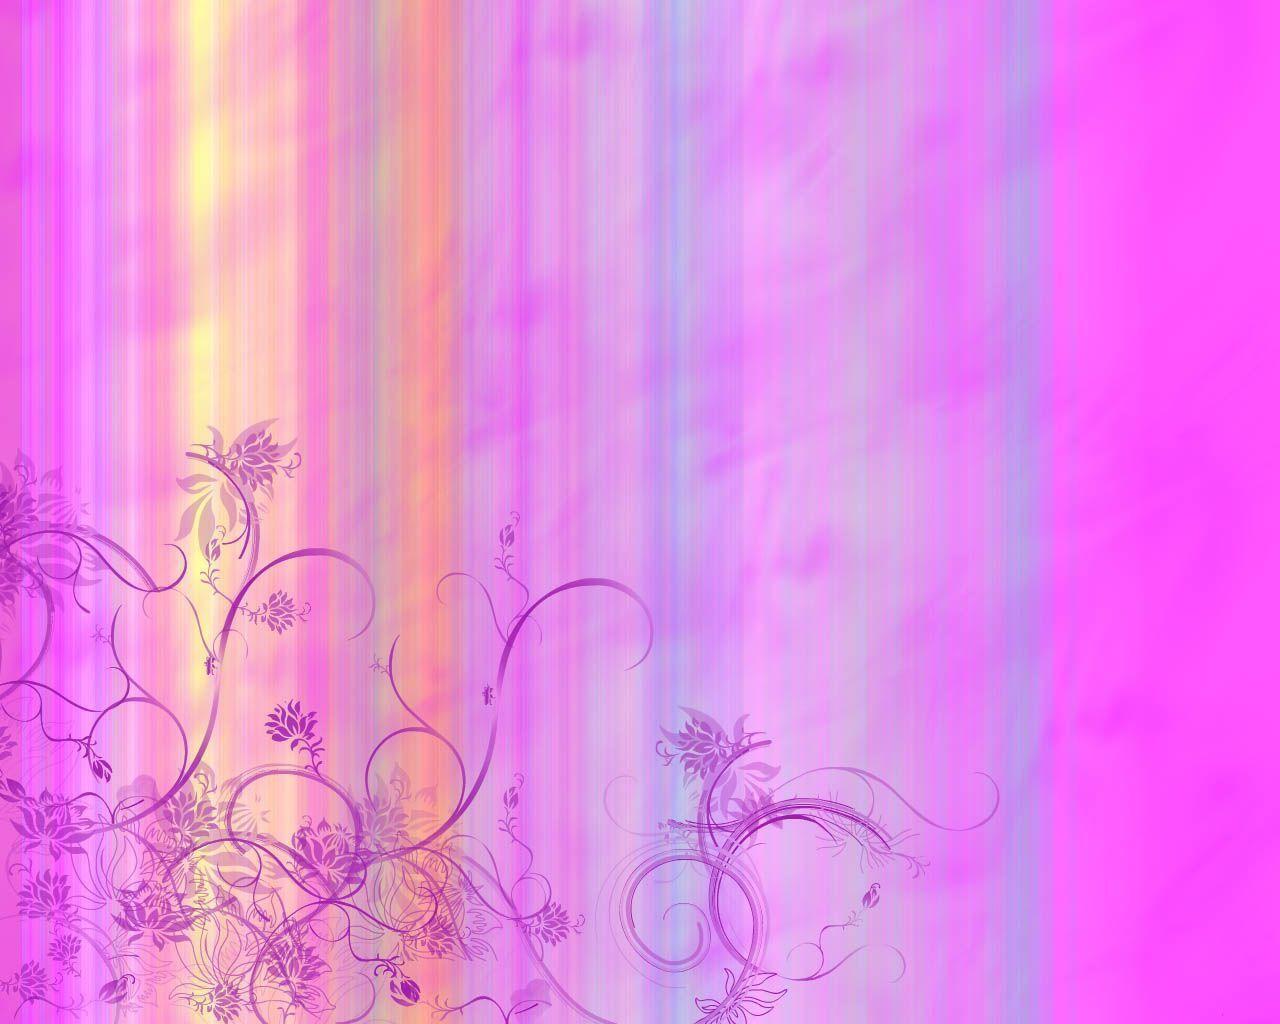 Pink Wallpapers - Wallpaper Cave